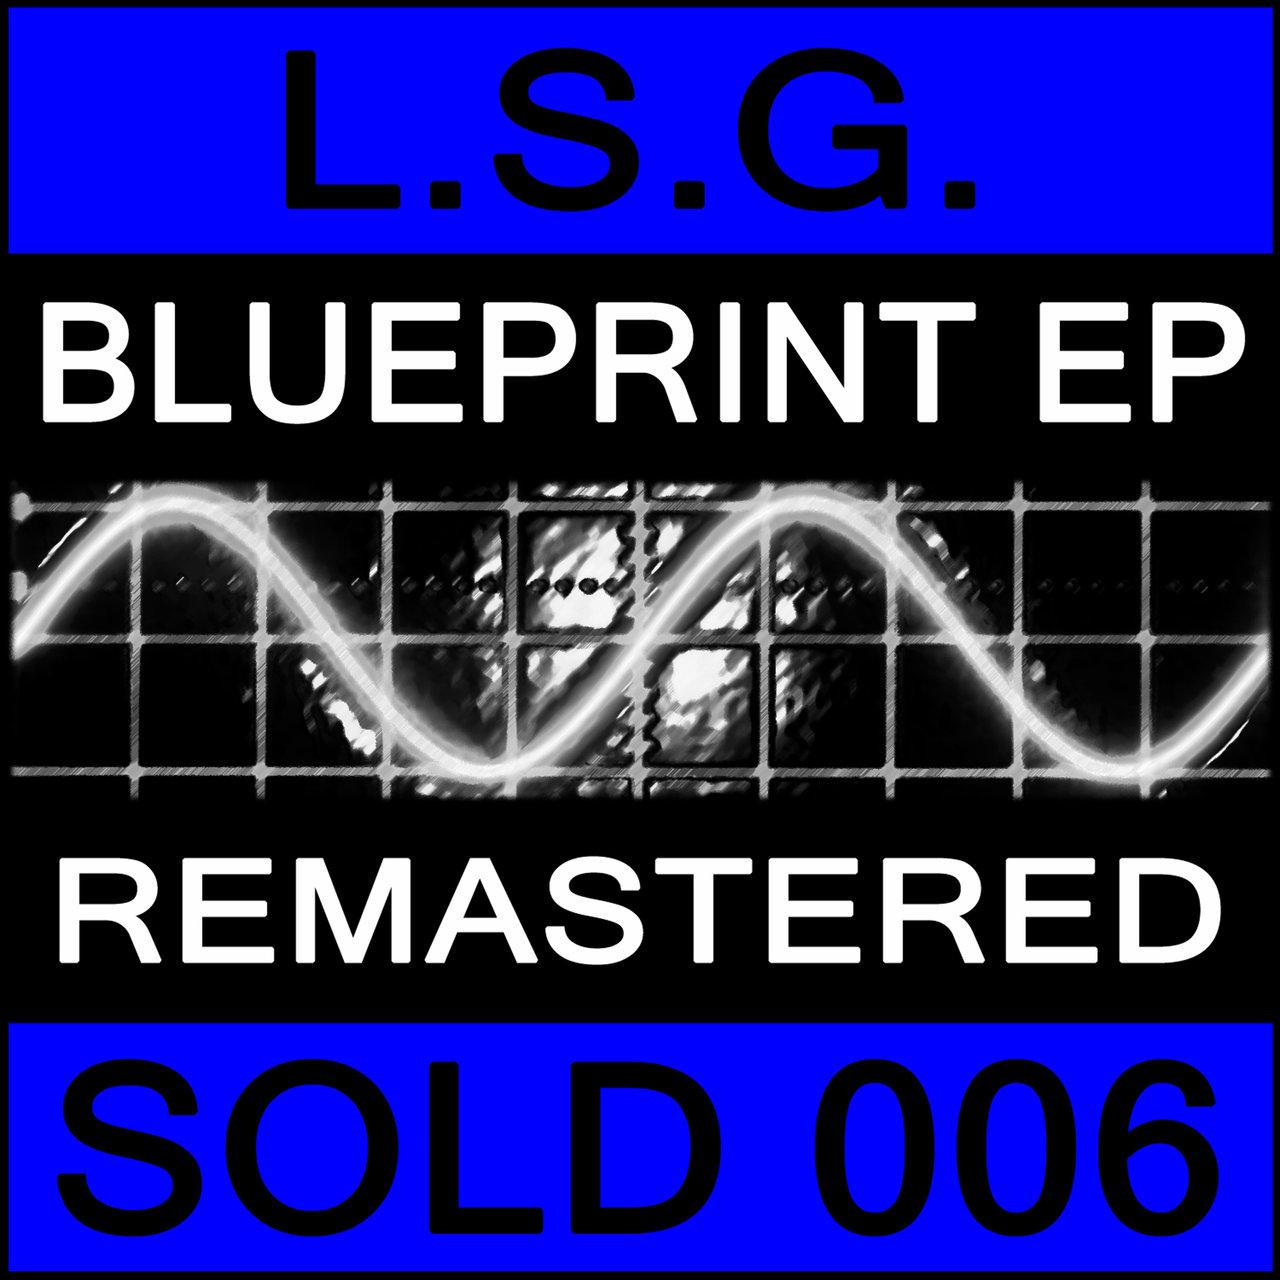 Tidal listen to blueprint ep on tidal blueprint ep malvernweather Images